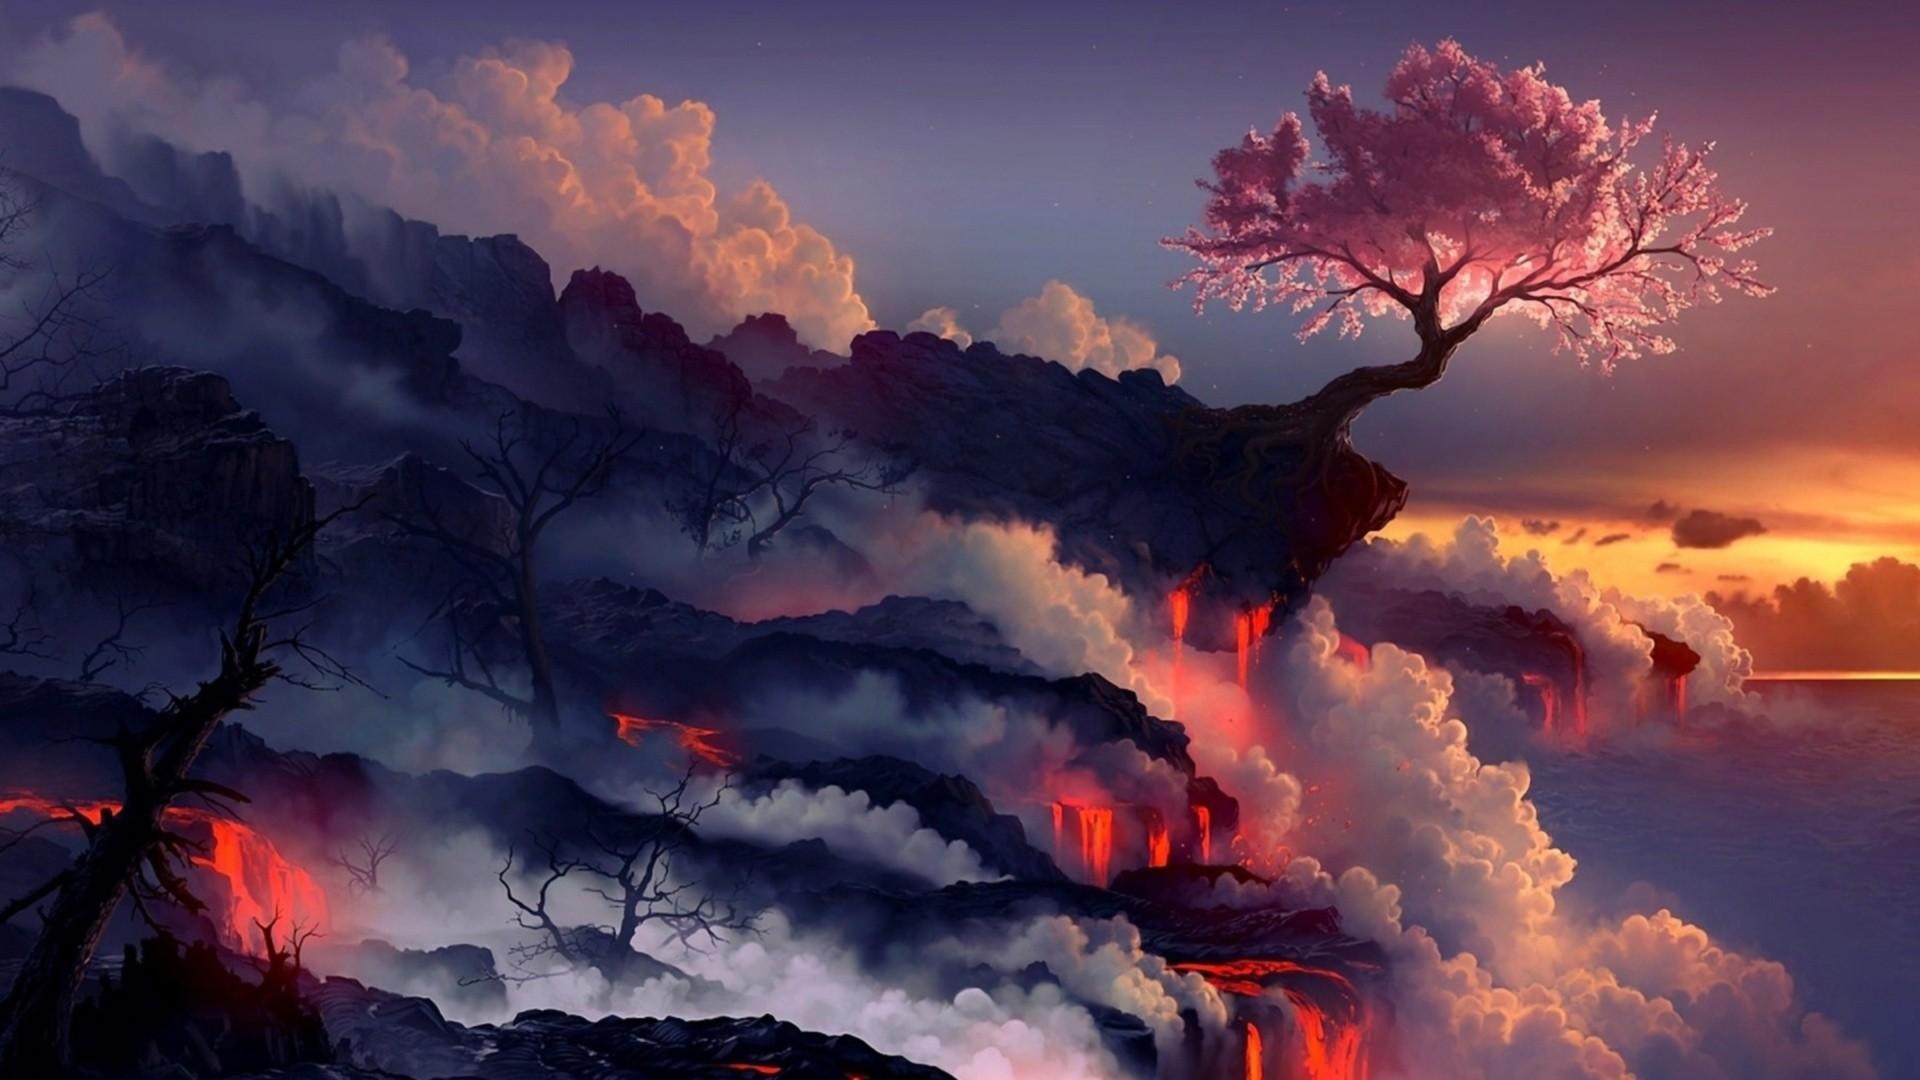 asian landscape wallpaper (62+ images)